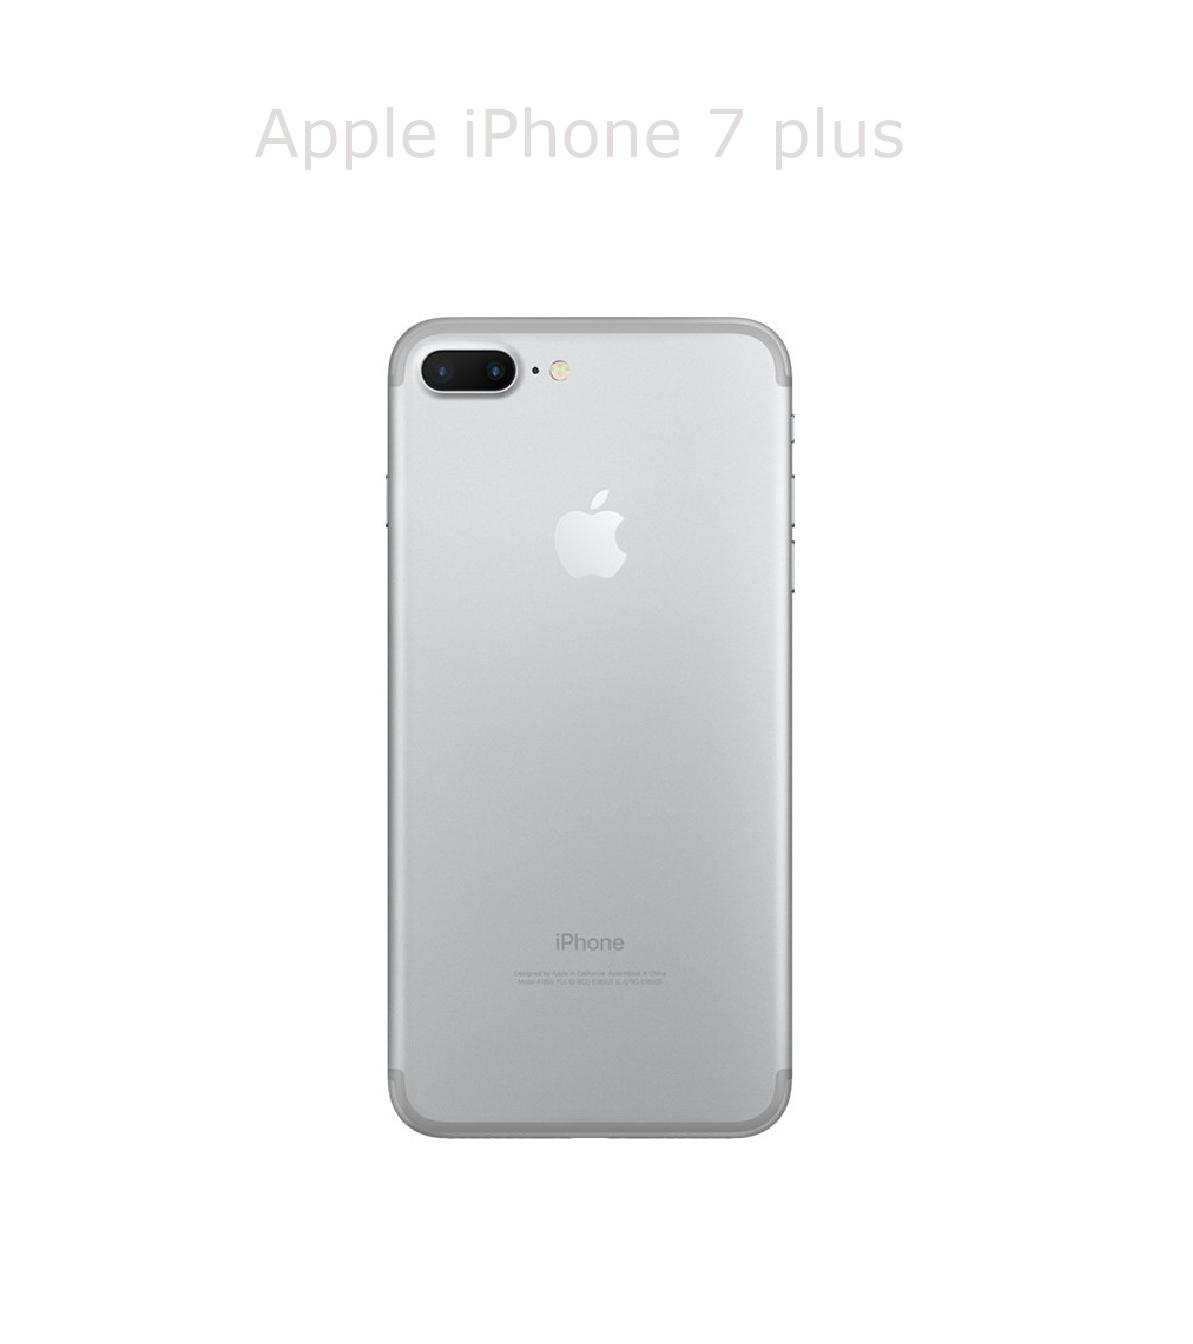 Laga baksida/chassi iPhone 7 plus